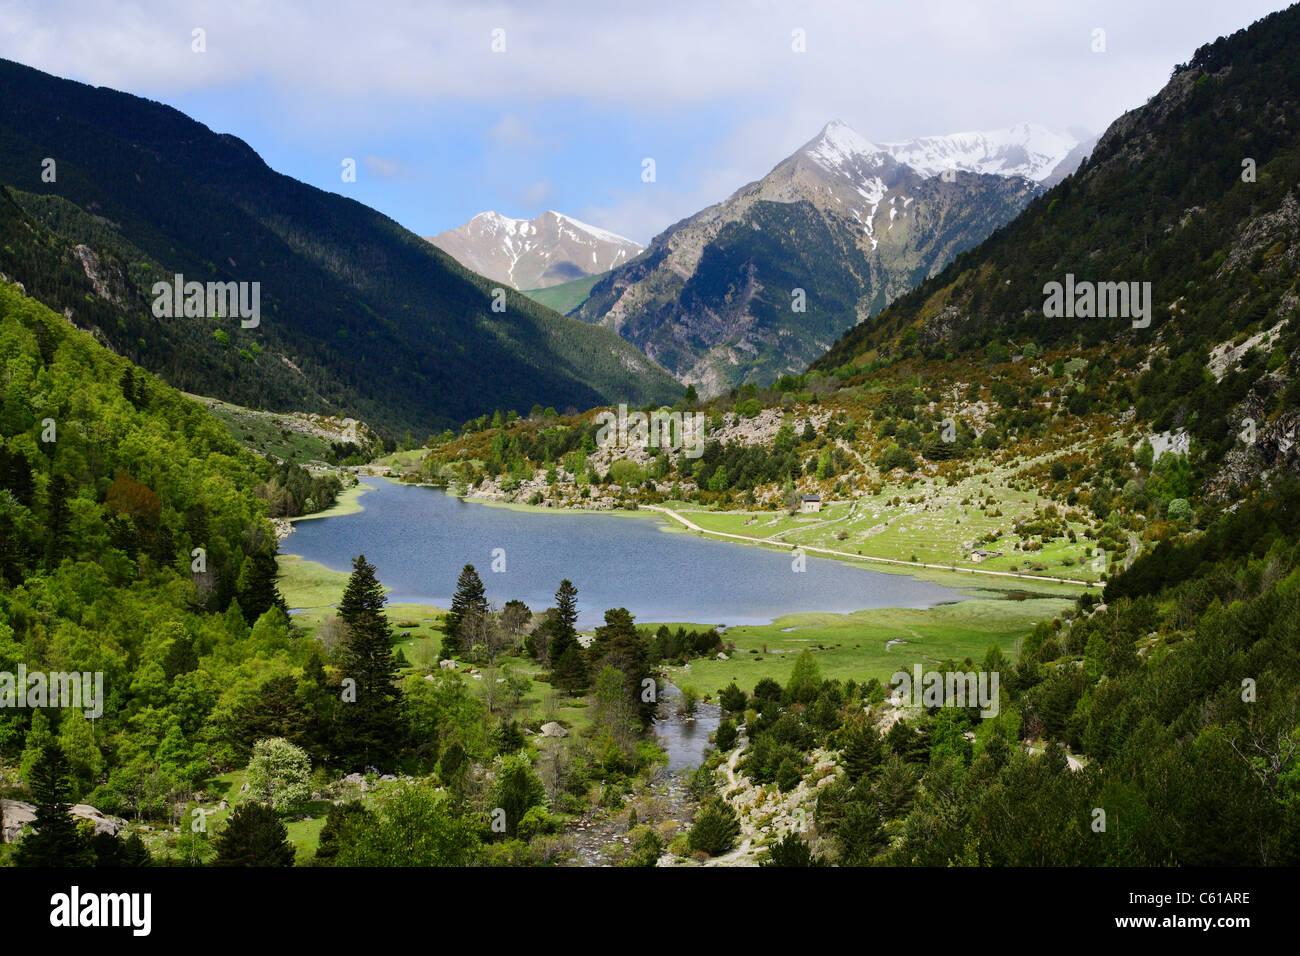 Estany de la Llebreta in Aiguestortes i Estany de Sant Maurici, National Park in the Pyrenees mountains Spain - Stock Image